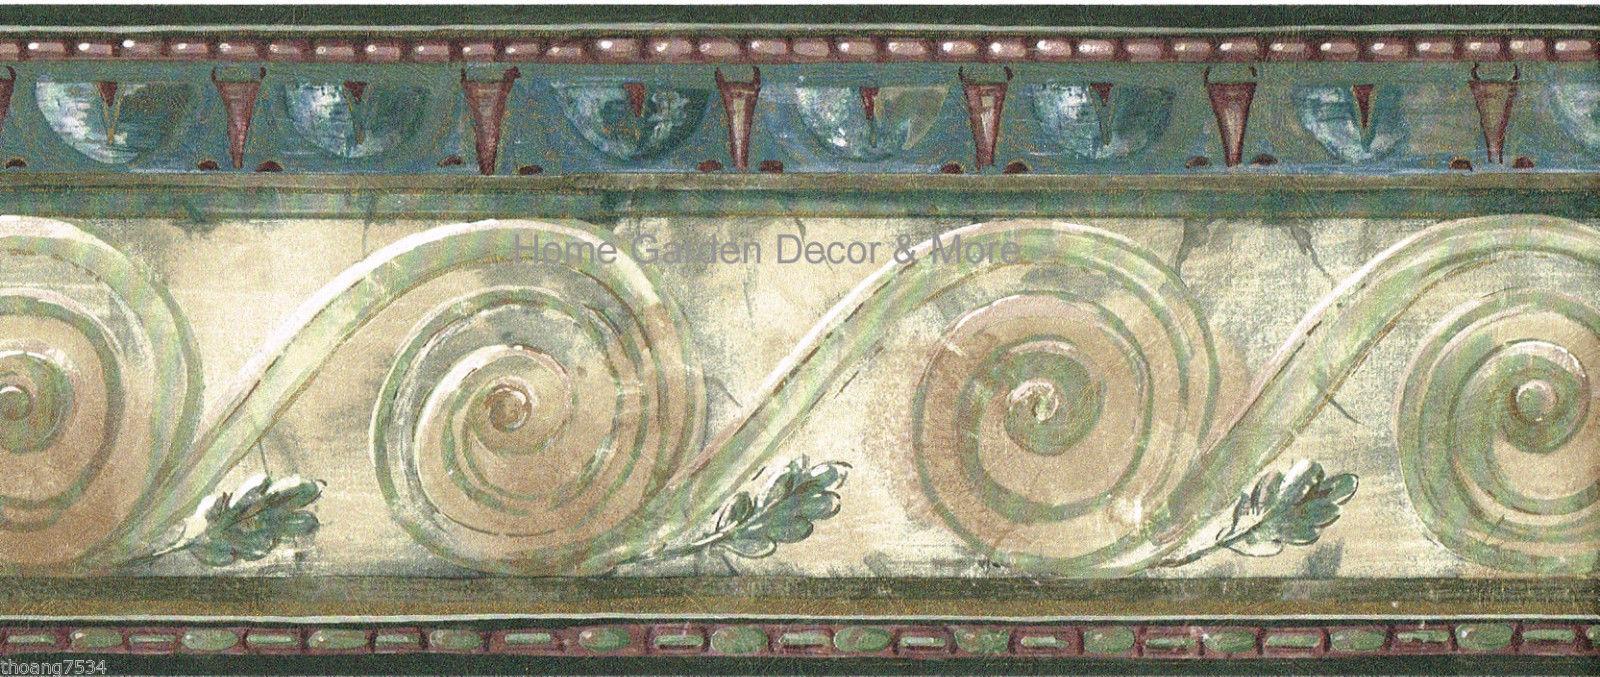 wall paper border crown molding scroll leaf wallpaper border norwall 1600x677